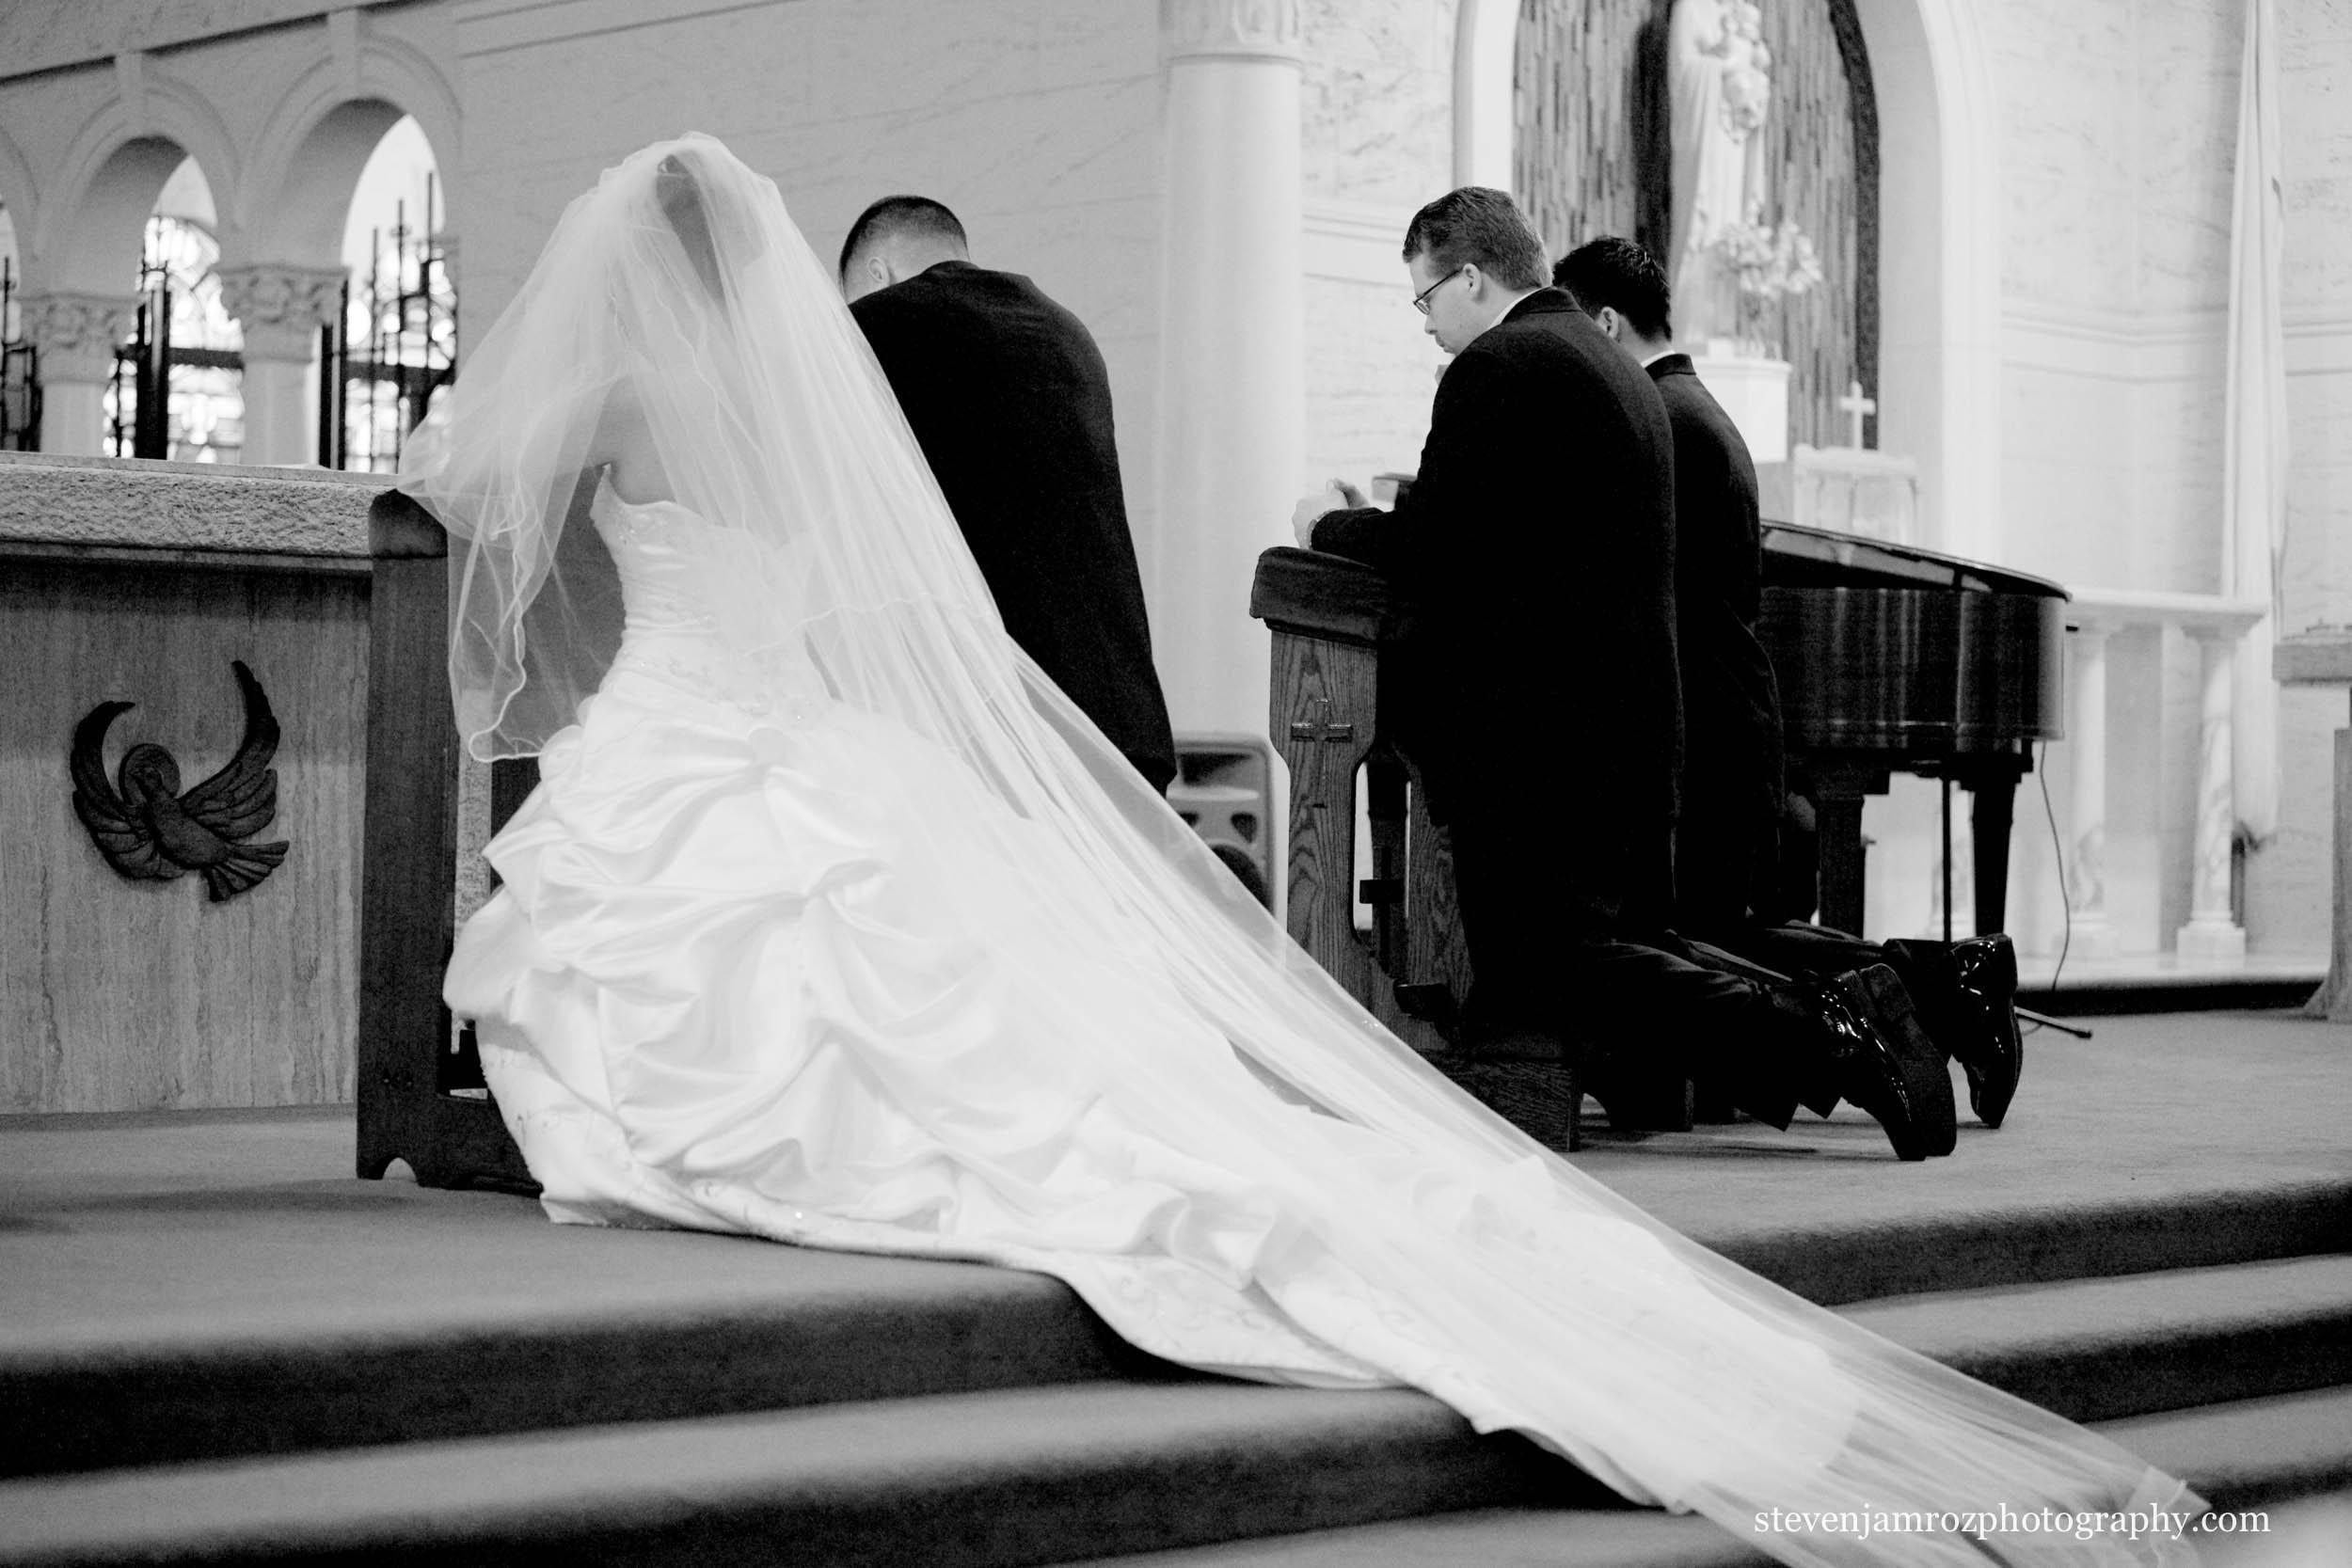 kneeling-alter-wedding-couple-raleigh-0805.jpg